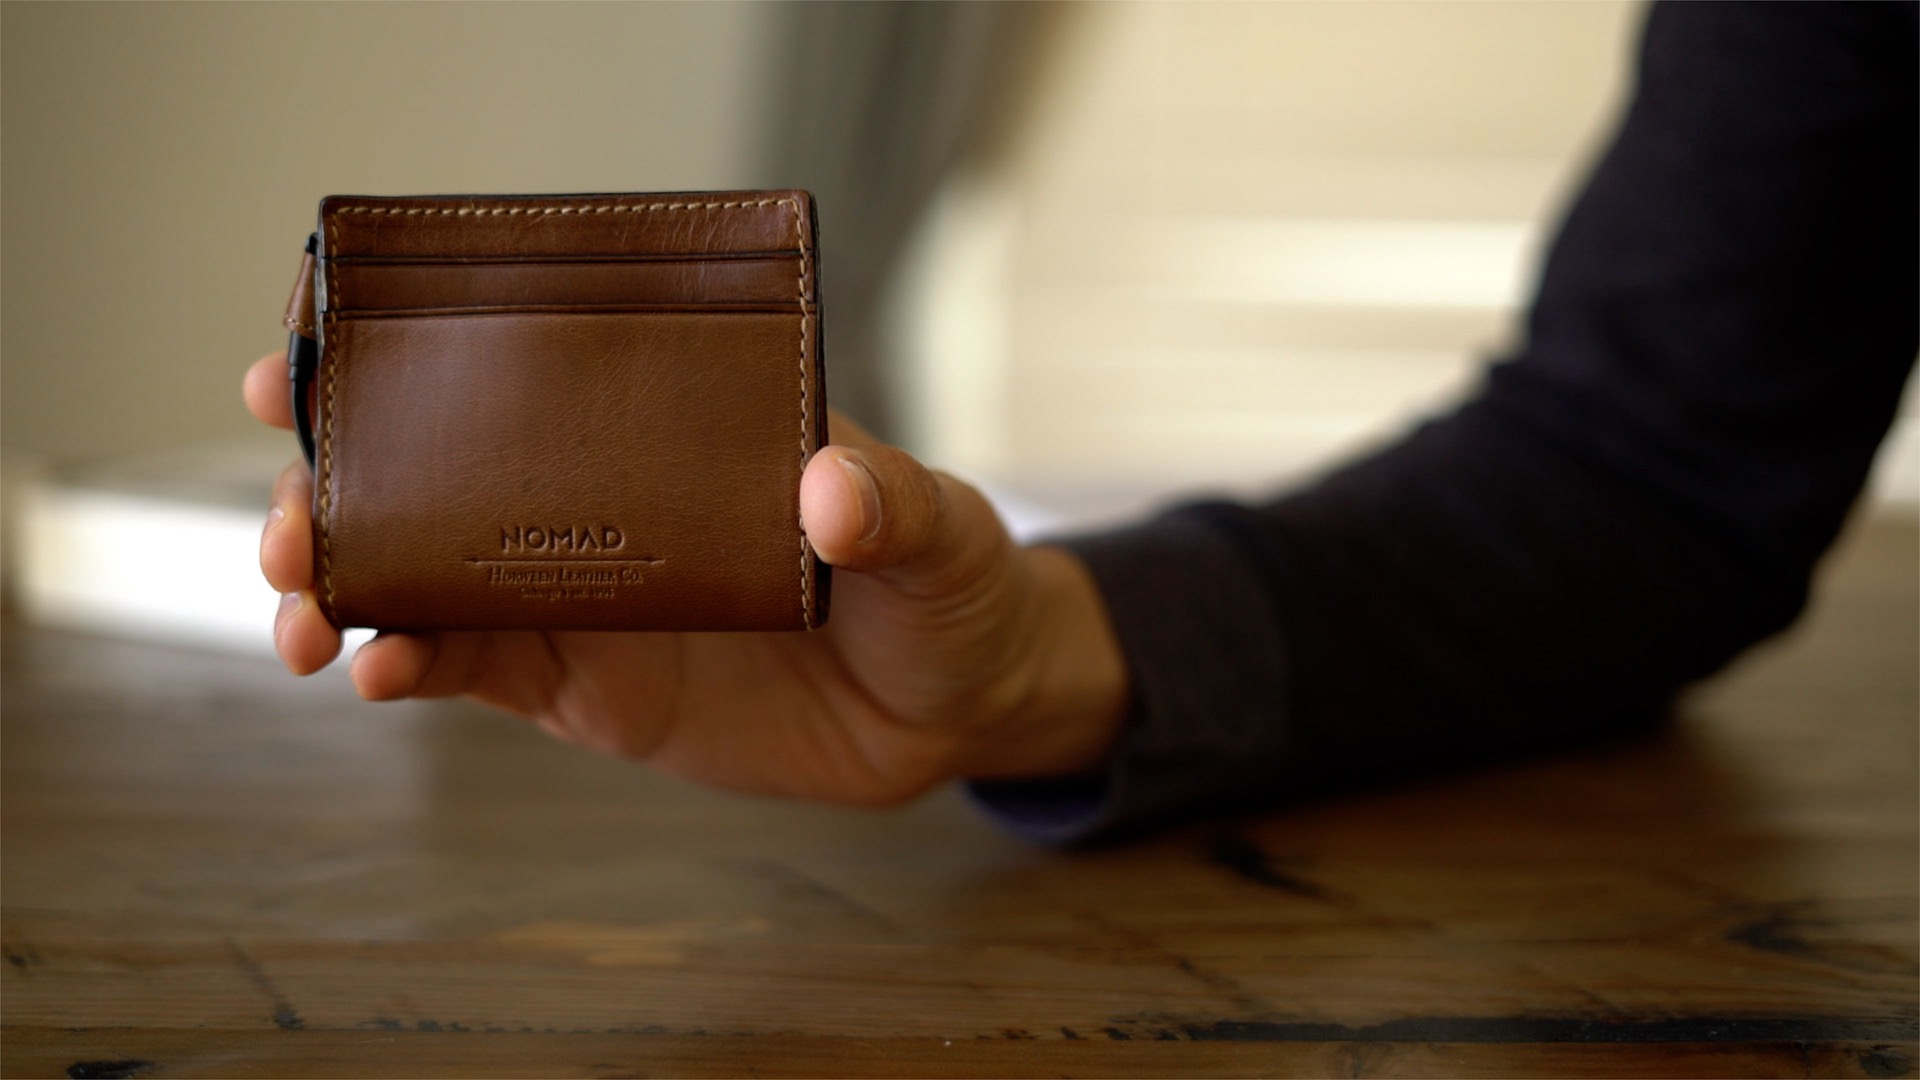 nomad-leather-wallet-integrated-battery-mfi-lightning-hands-on-02